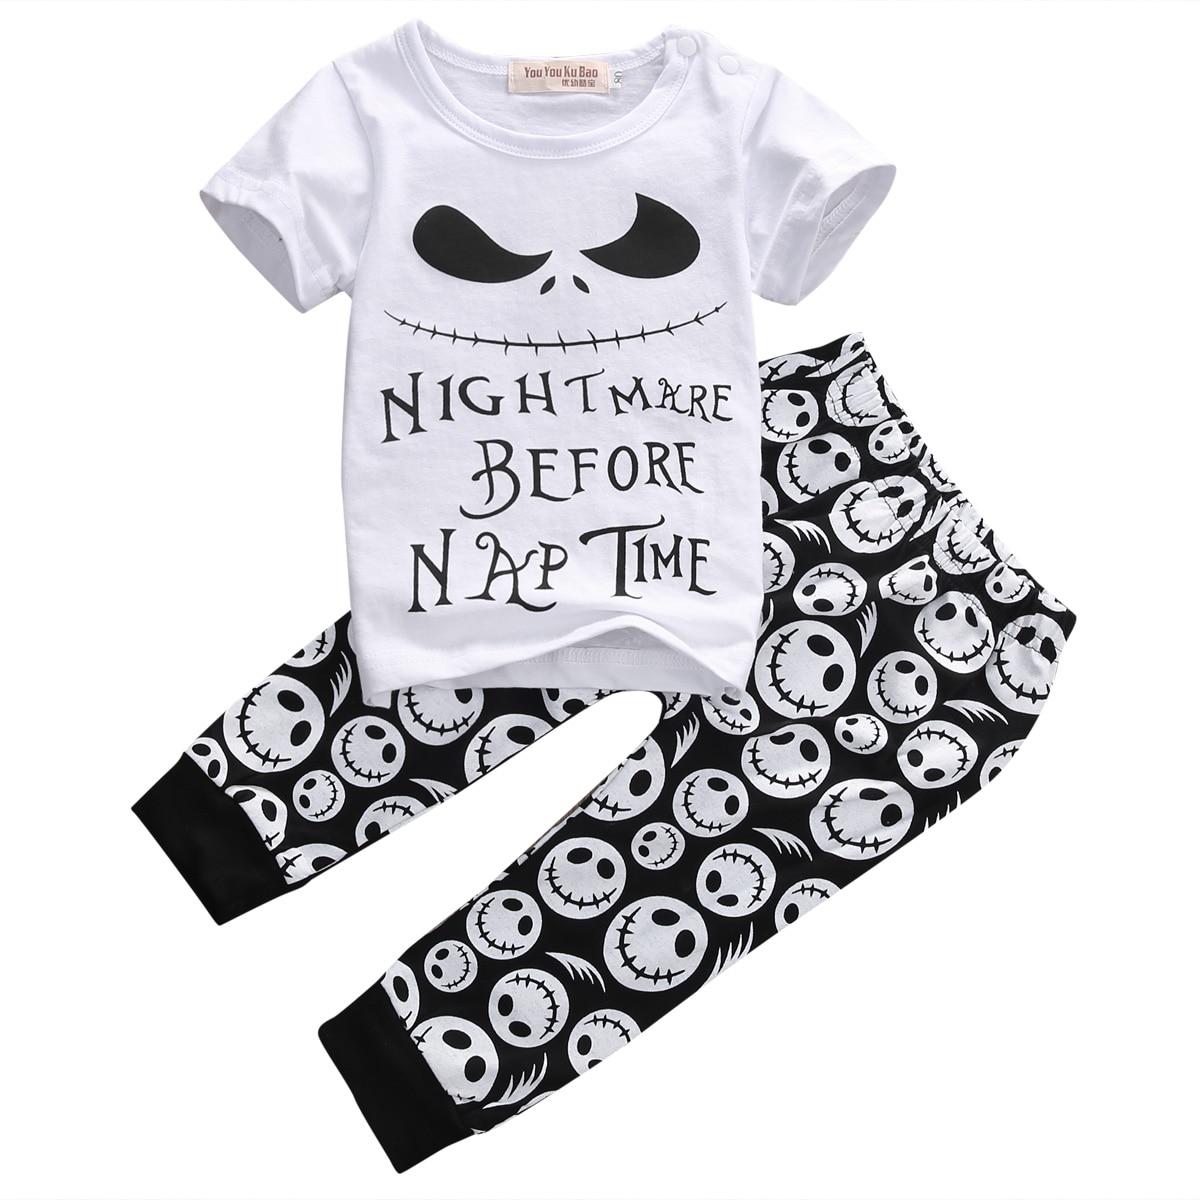 2PCS/New Cartoon Cotton Halloween Letter Clothing Set Baby Boy Children Kids T-shirt+Pants Toddler boy summer Outfits Clothes цена 2016